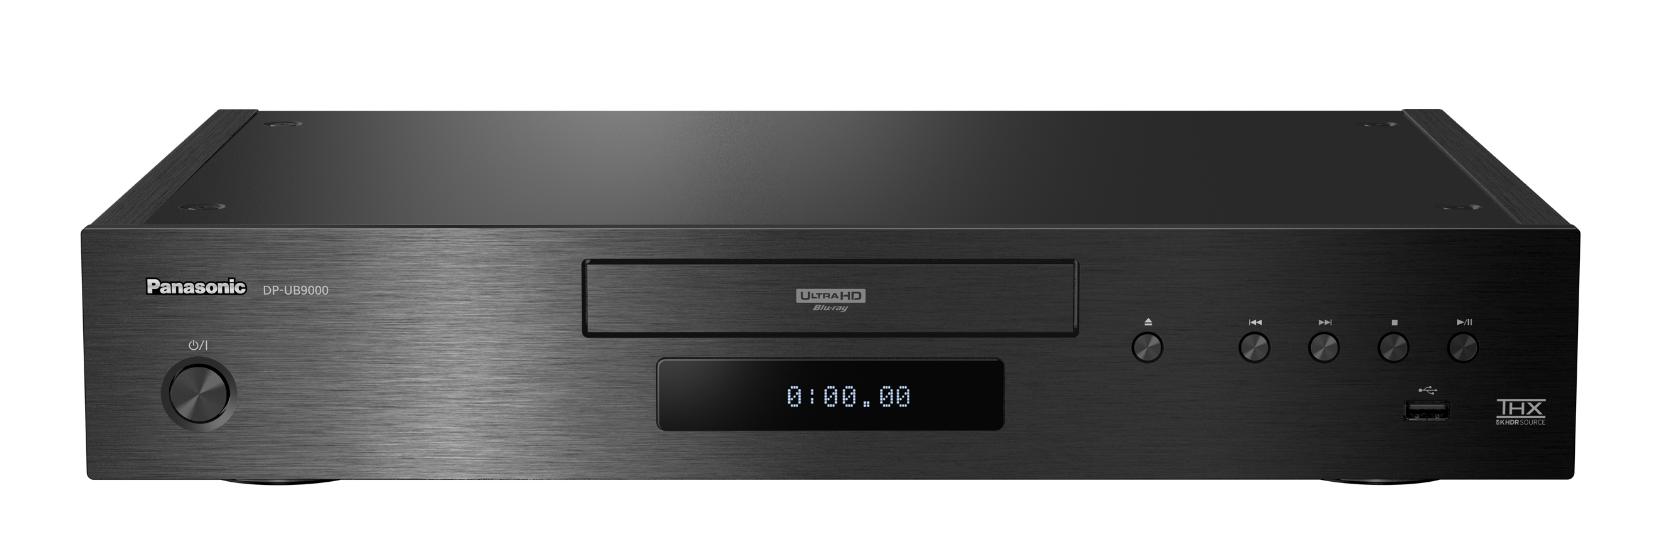 Panasonic Dp Ub9000 4k Uhd Bluray Player In Stock Now Panasonic Rio Sound And Vision